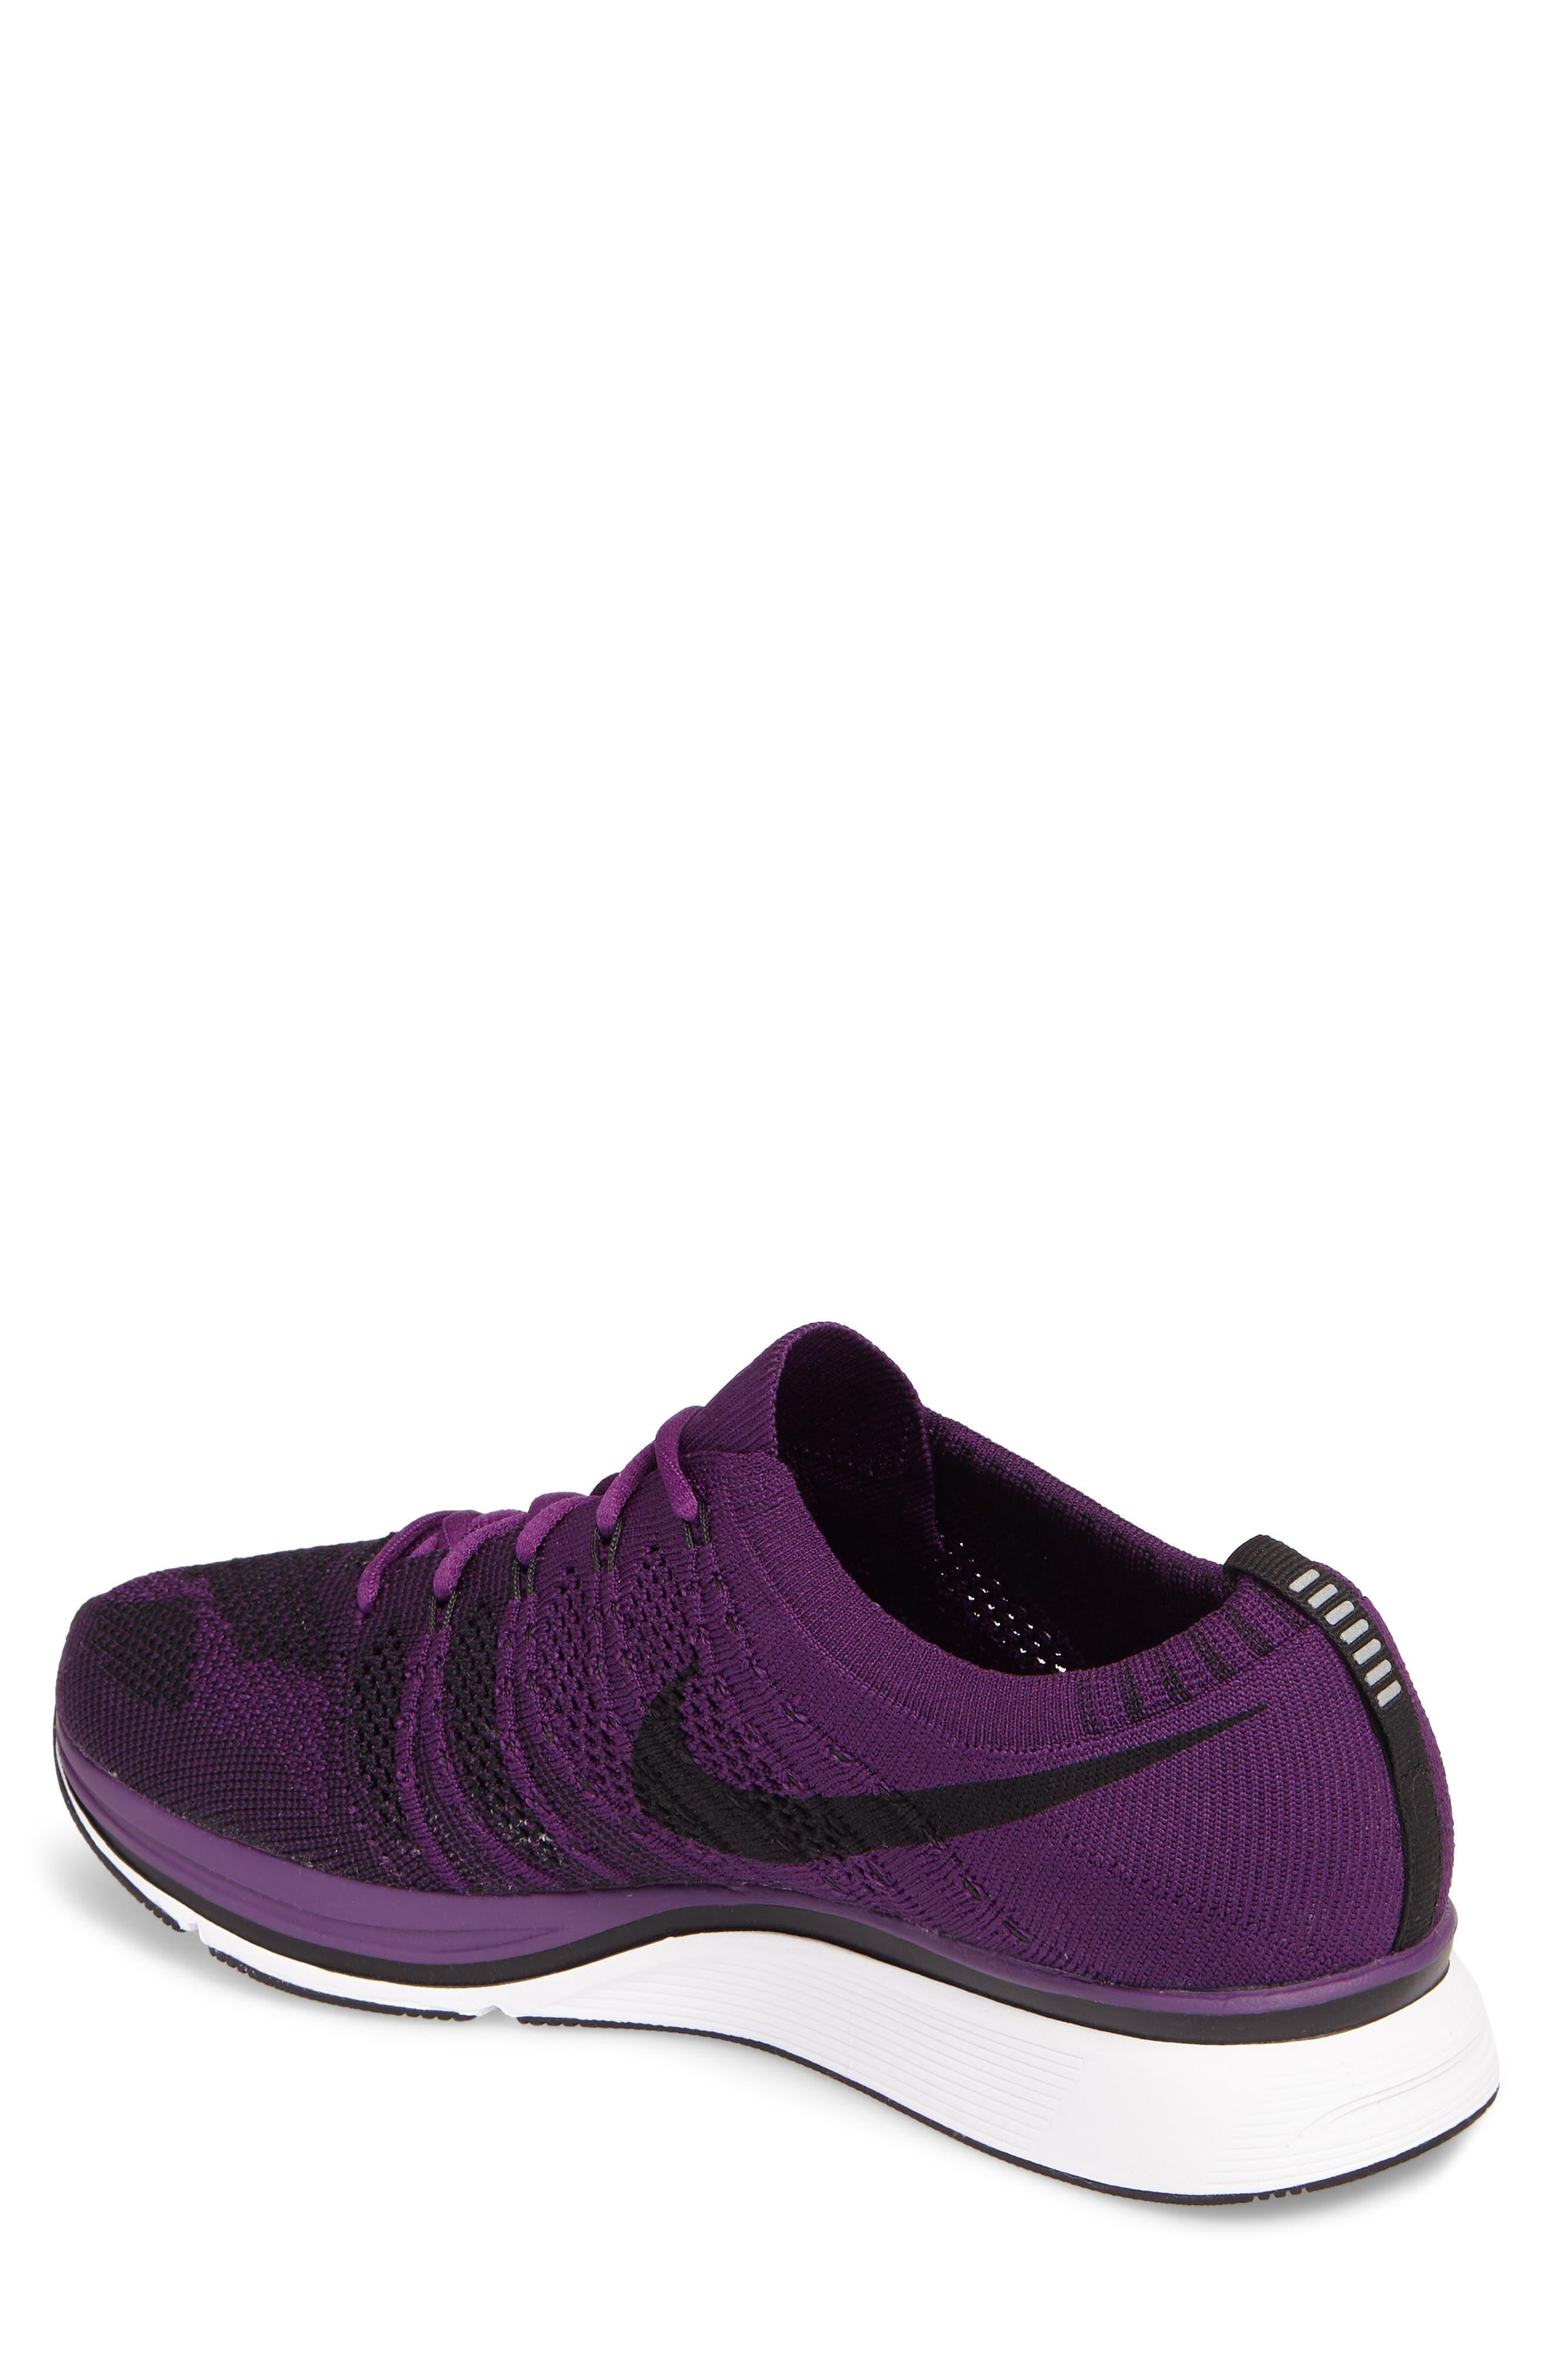 NikeLab Flyknit Trainer Sneaker,                             Alternate thumbnail 2, color,                             NIGHT PURPLE/ BLACK/ WHITE